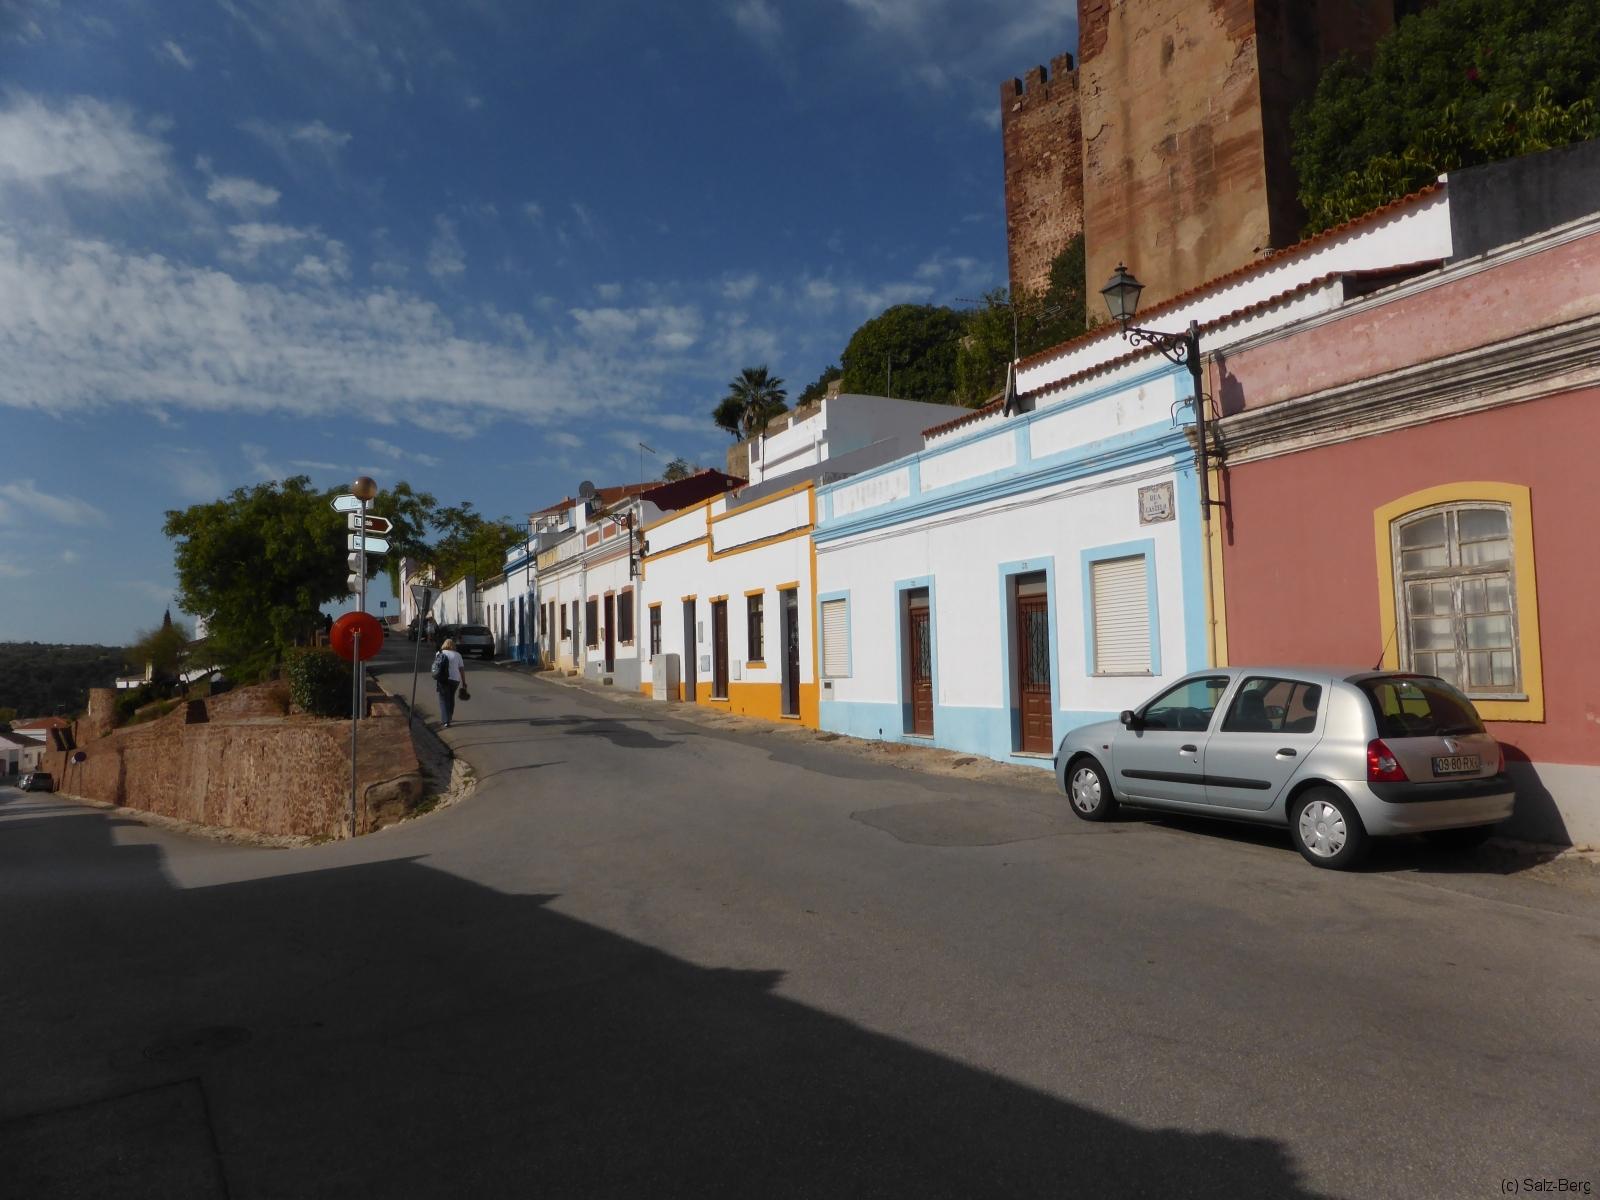 Algarve-238-P1050764